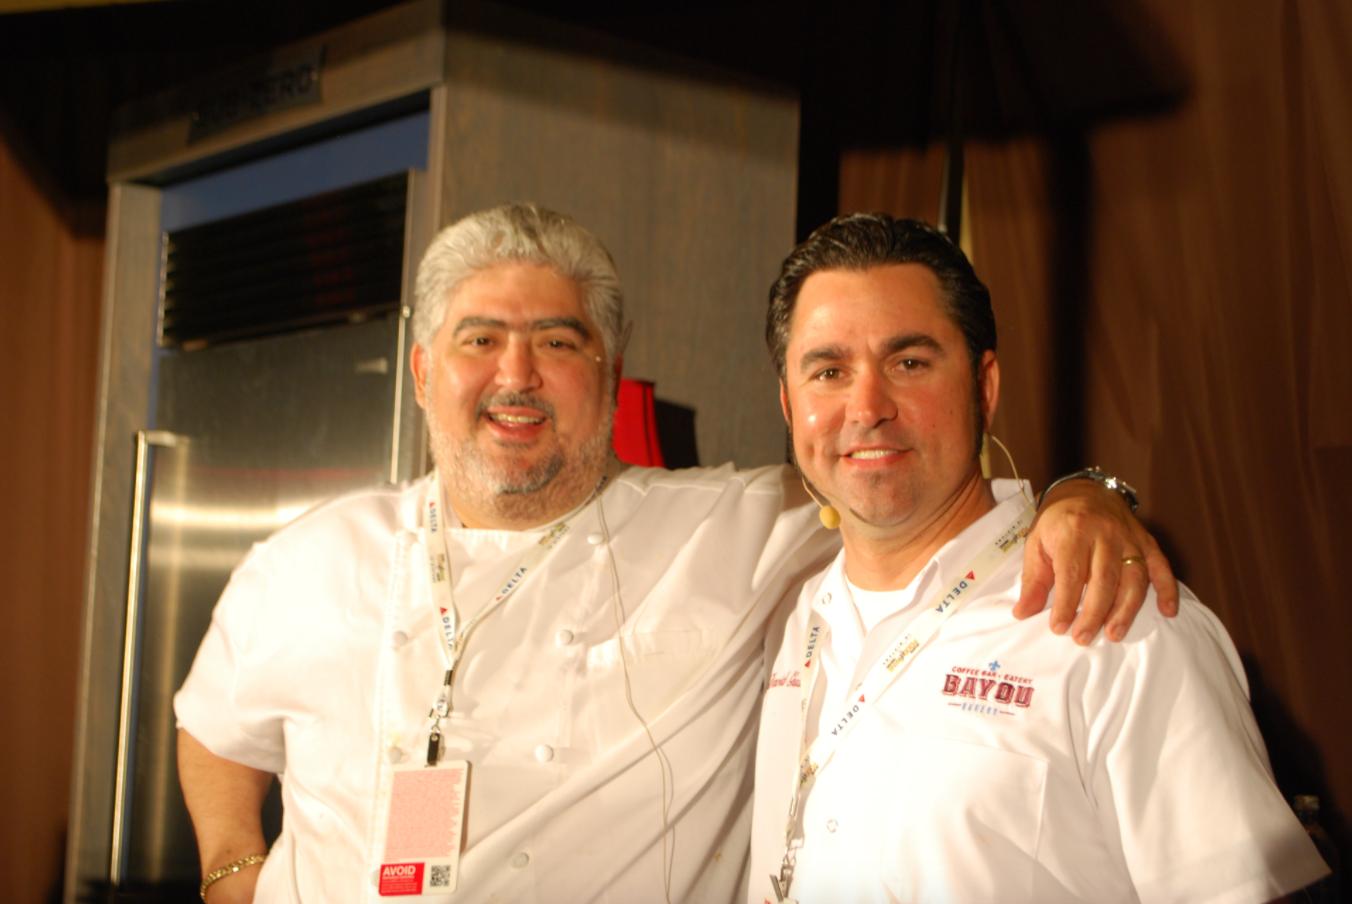 Chefs Adolfo Garcia & David Guas at the 2013 Atlanta Food & Wine Festival